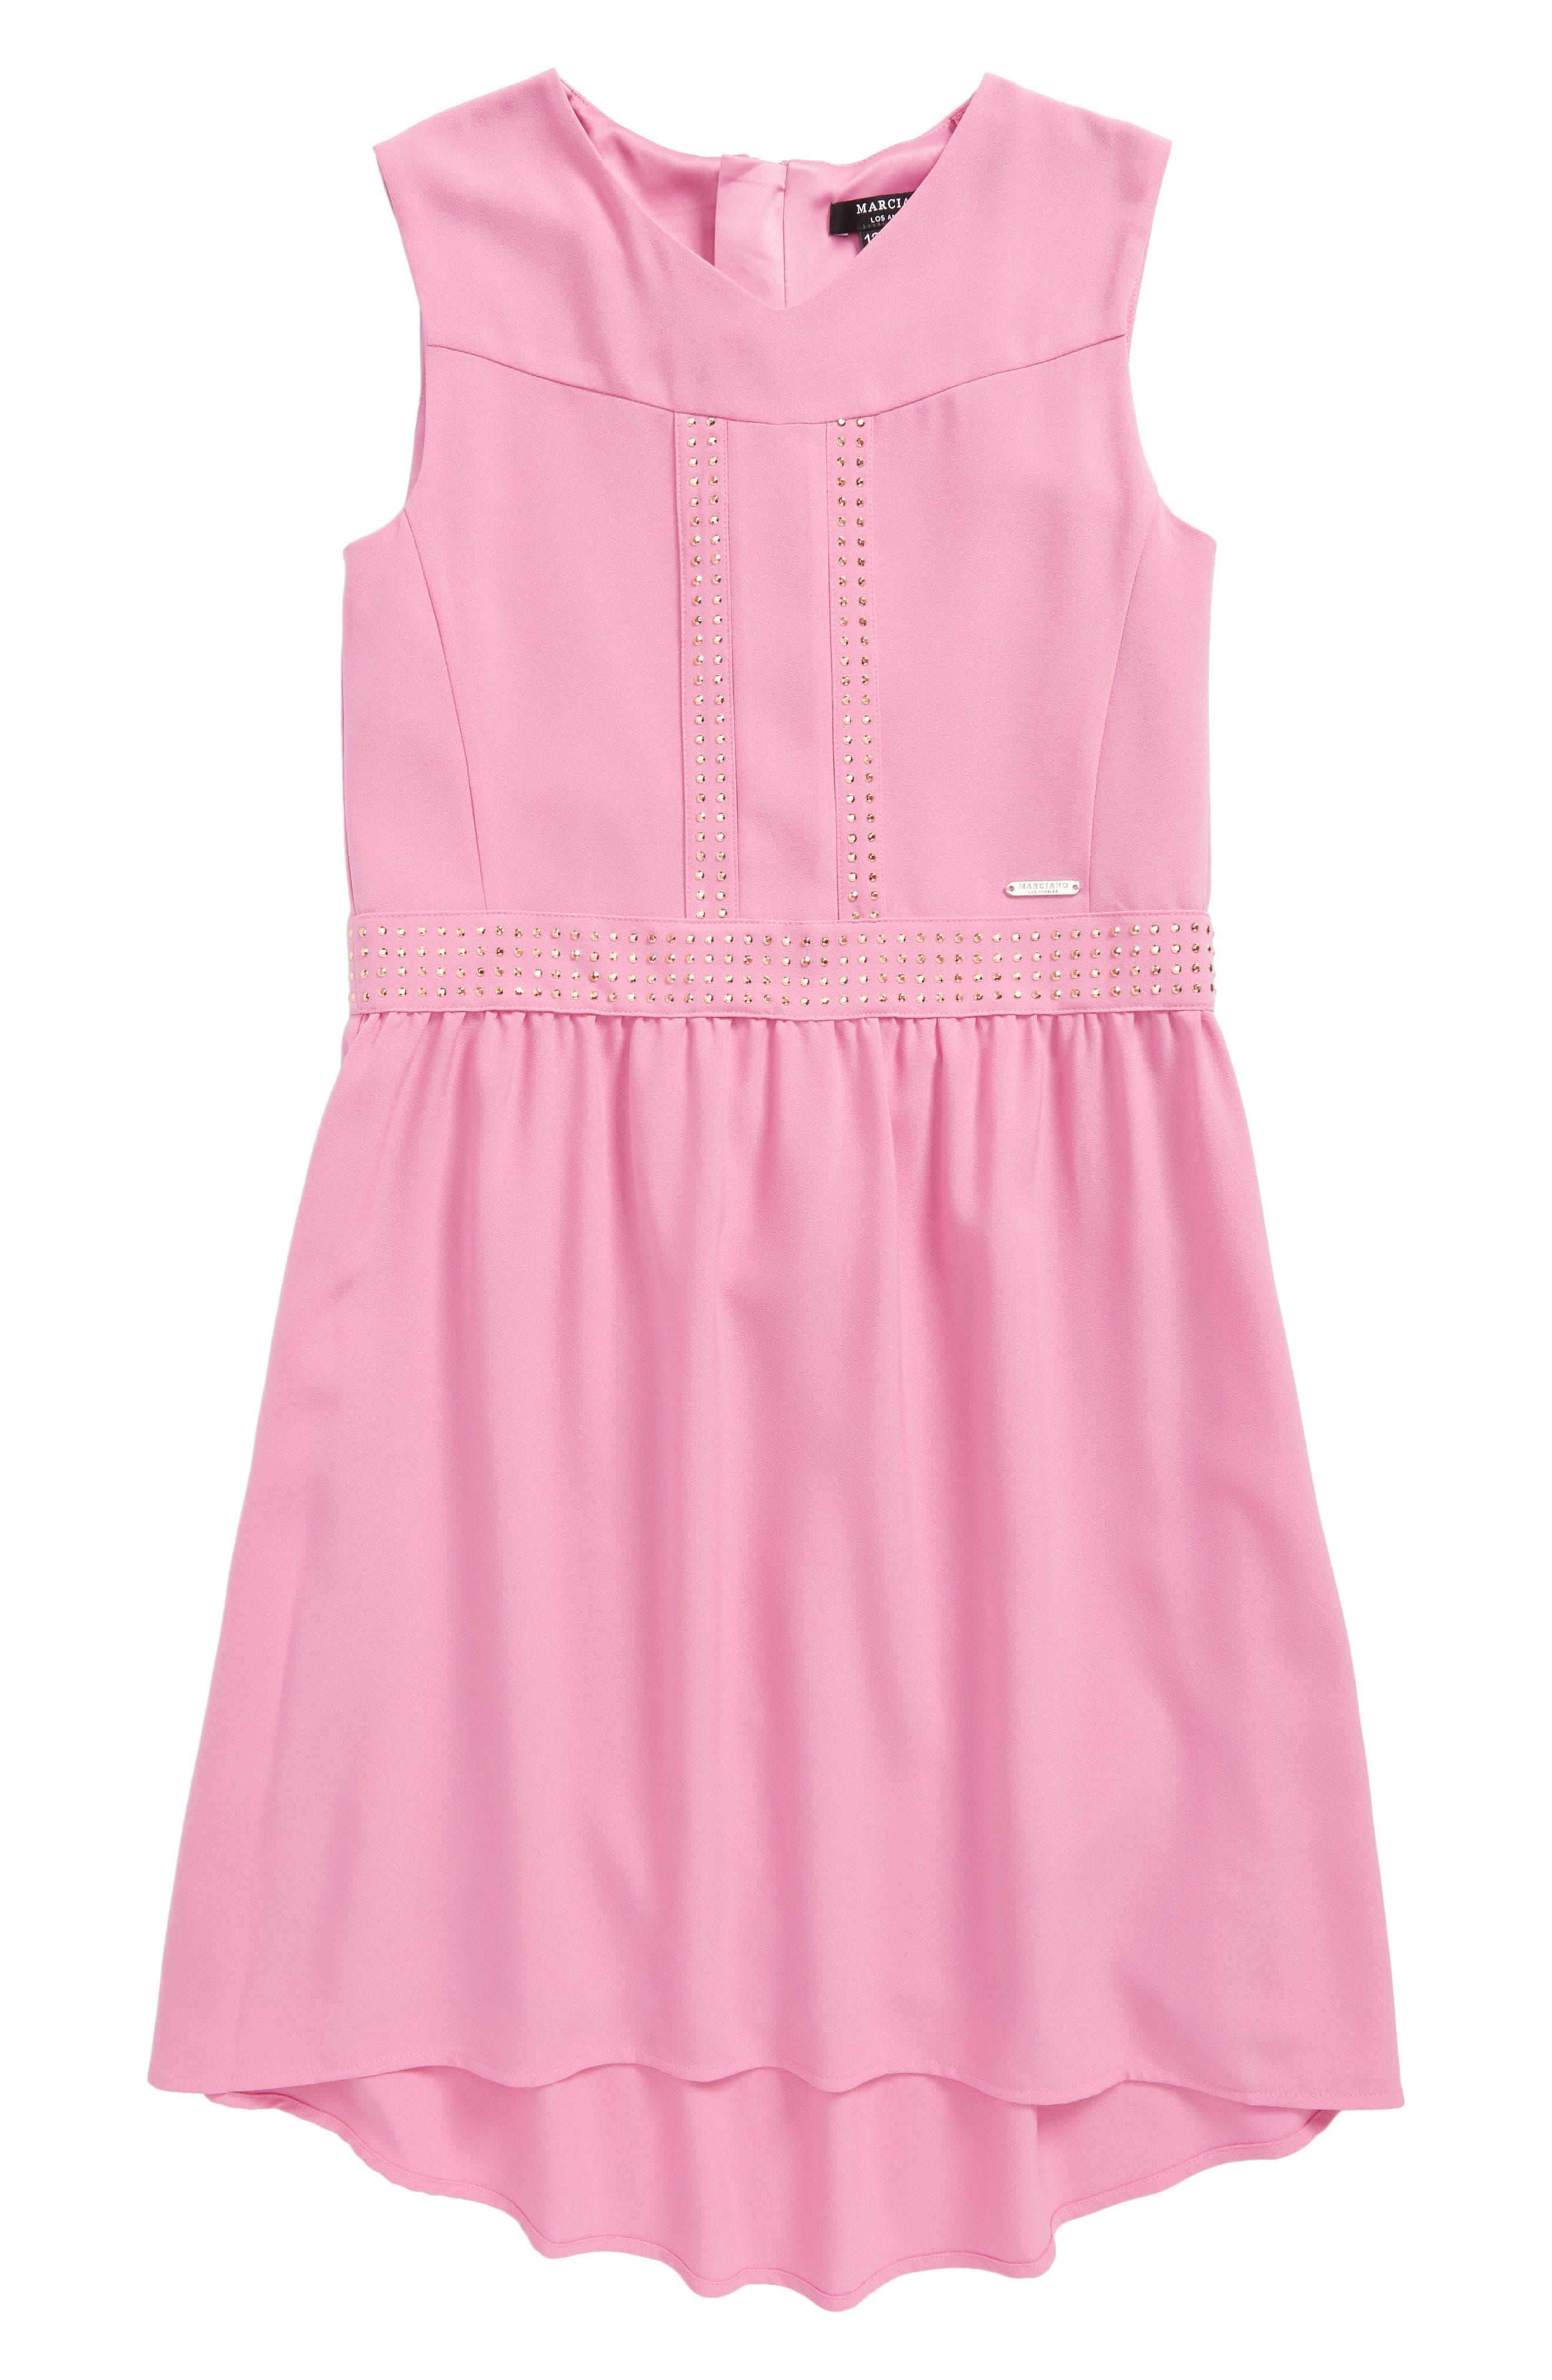 Alternate Image 1 Selected - Marciano Embellished Crepe High/Low Dress (Big Girls)